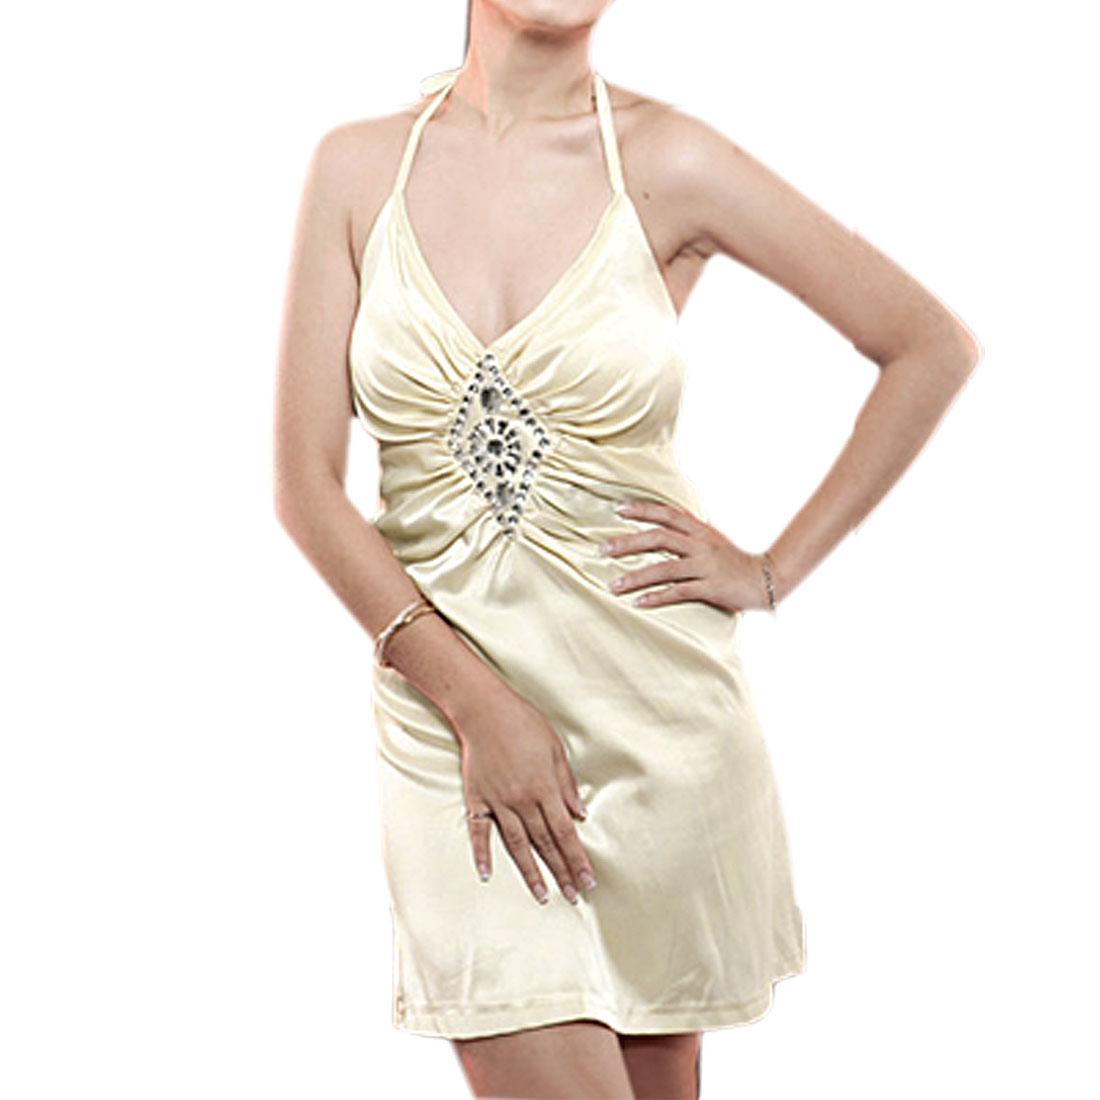 Ladies Plastic Crystal Decor Off White Halter Dress XS